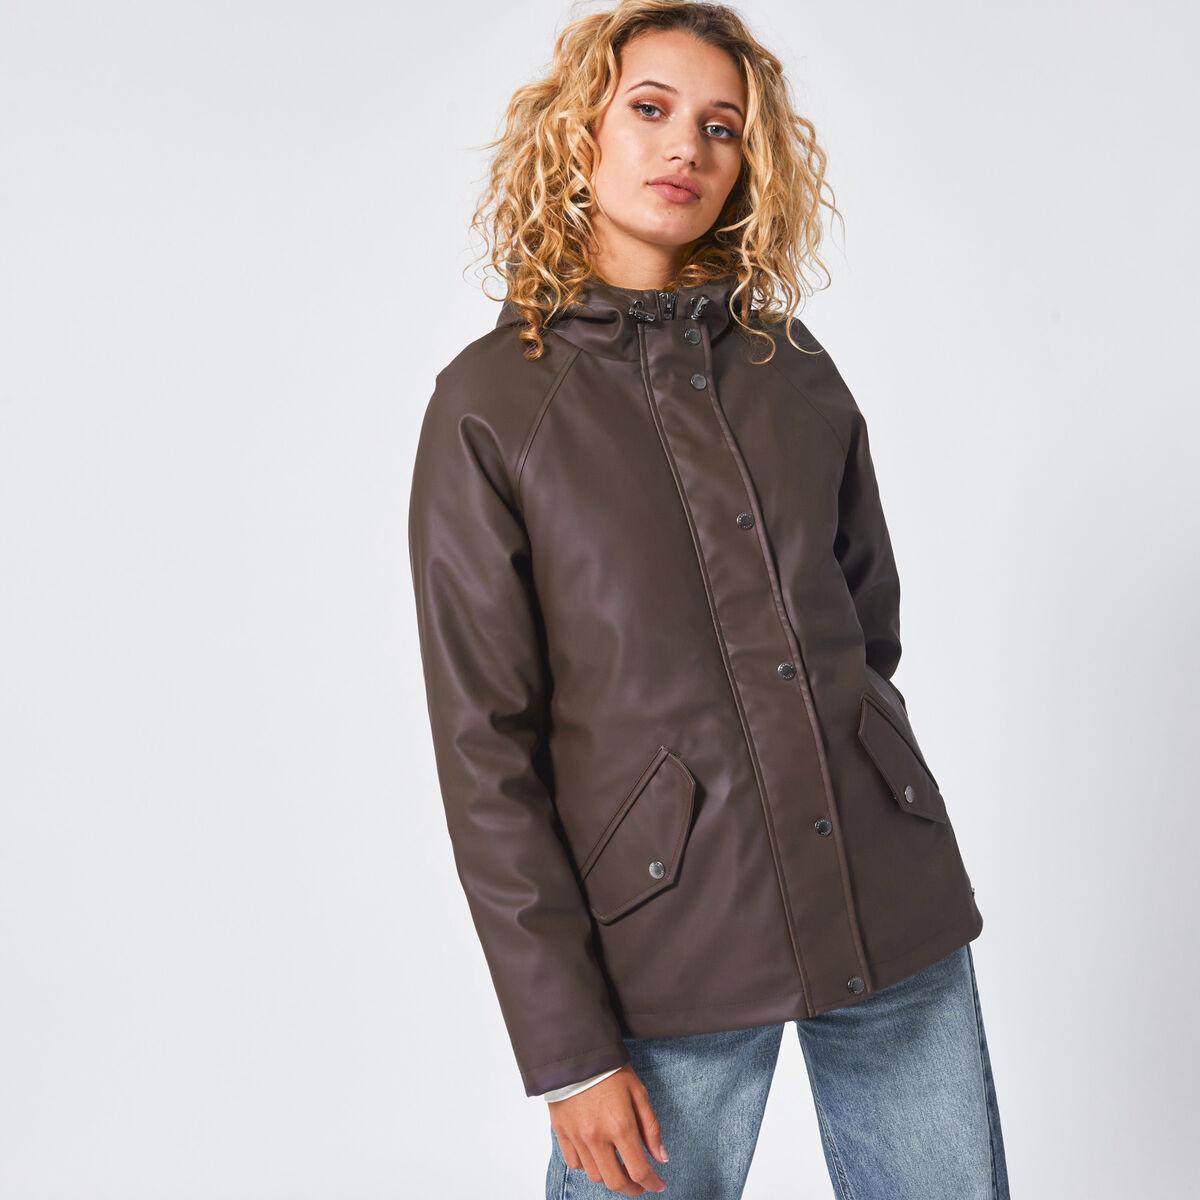 Rain jacket Janet S Teddy